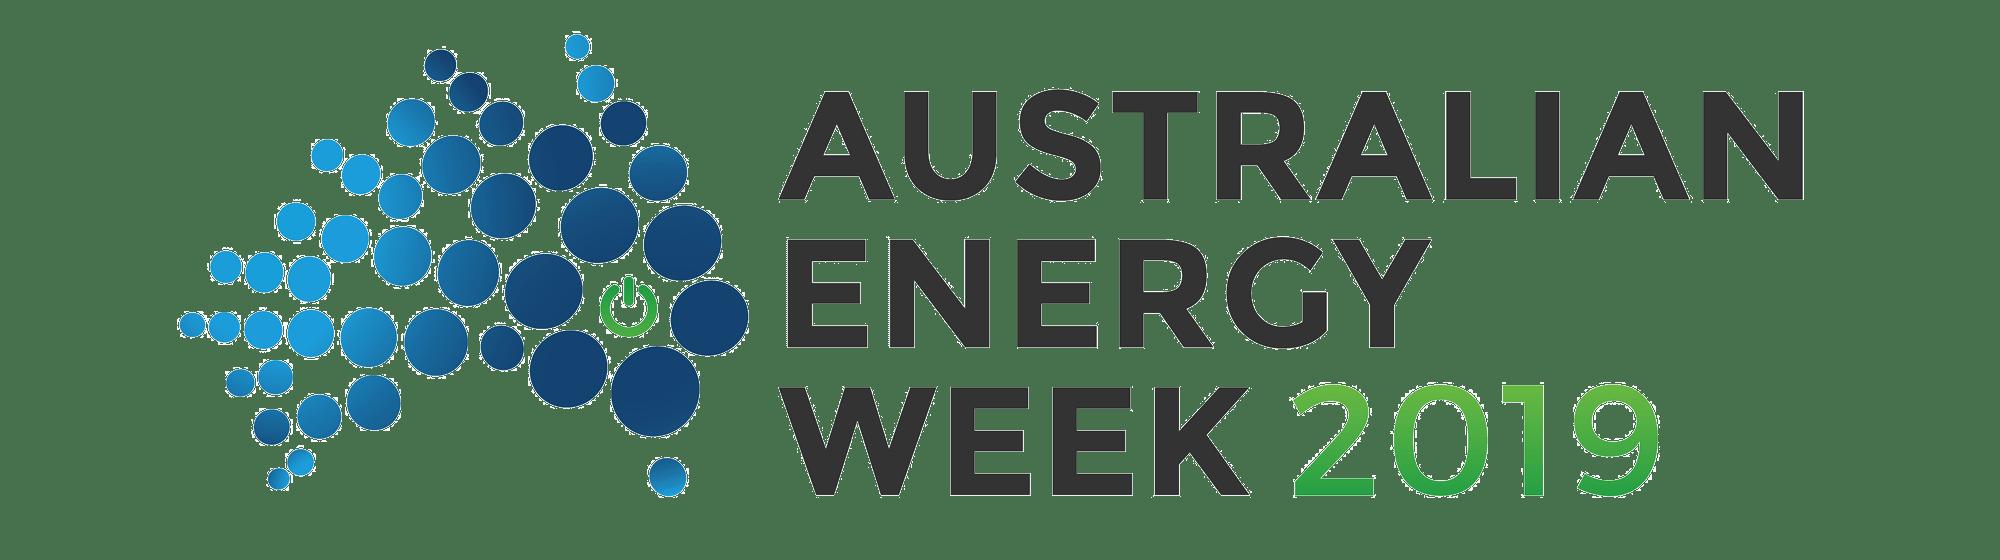 Australian Energy Week 2019